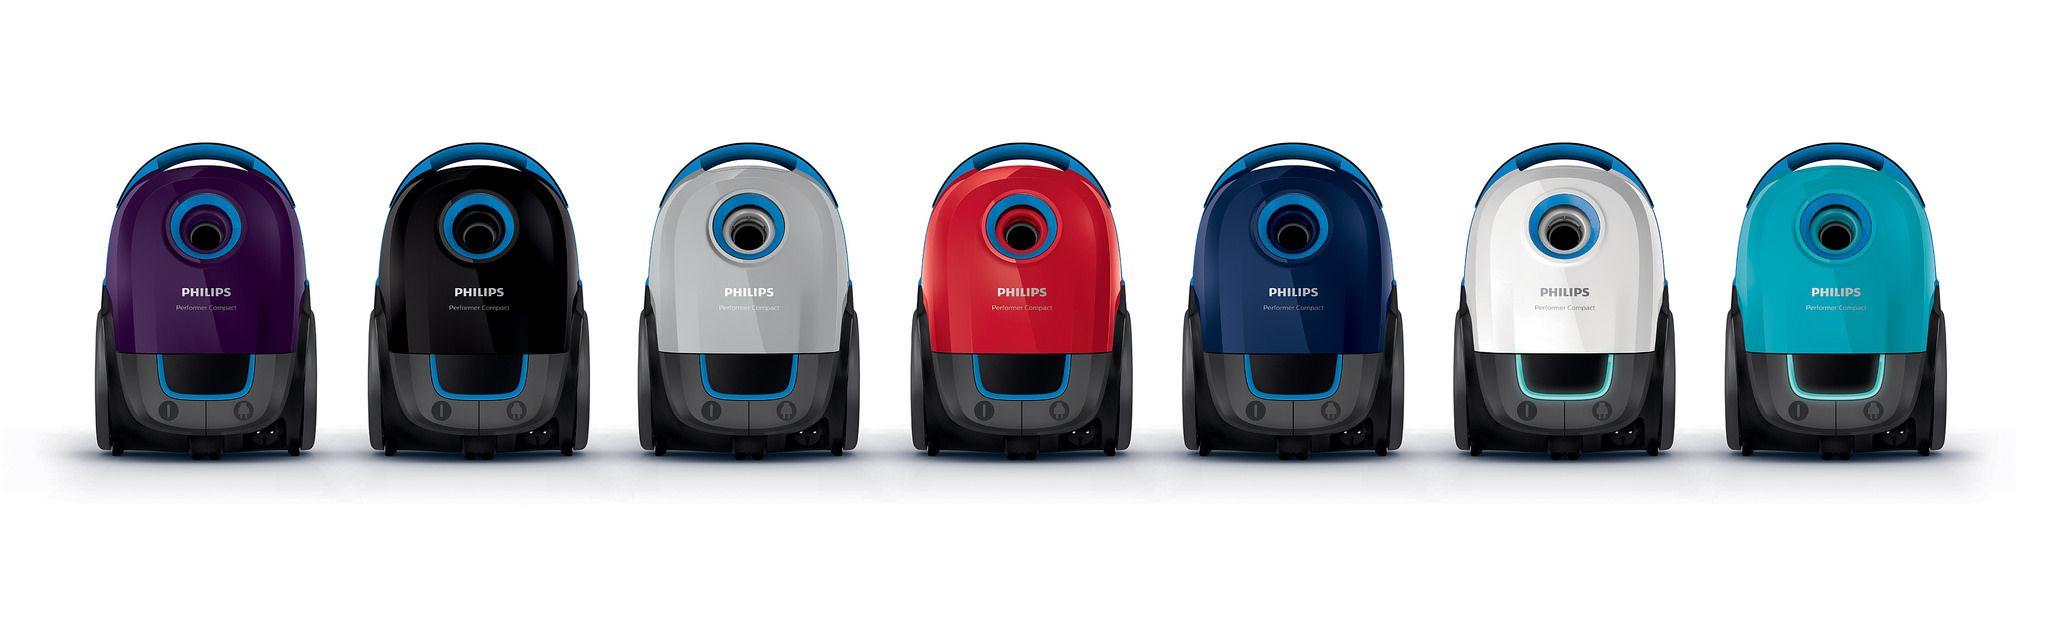 https://flic.kr/p/EDT2ro | Performer Compact Vacuum Cleaner (6)